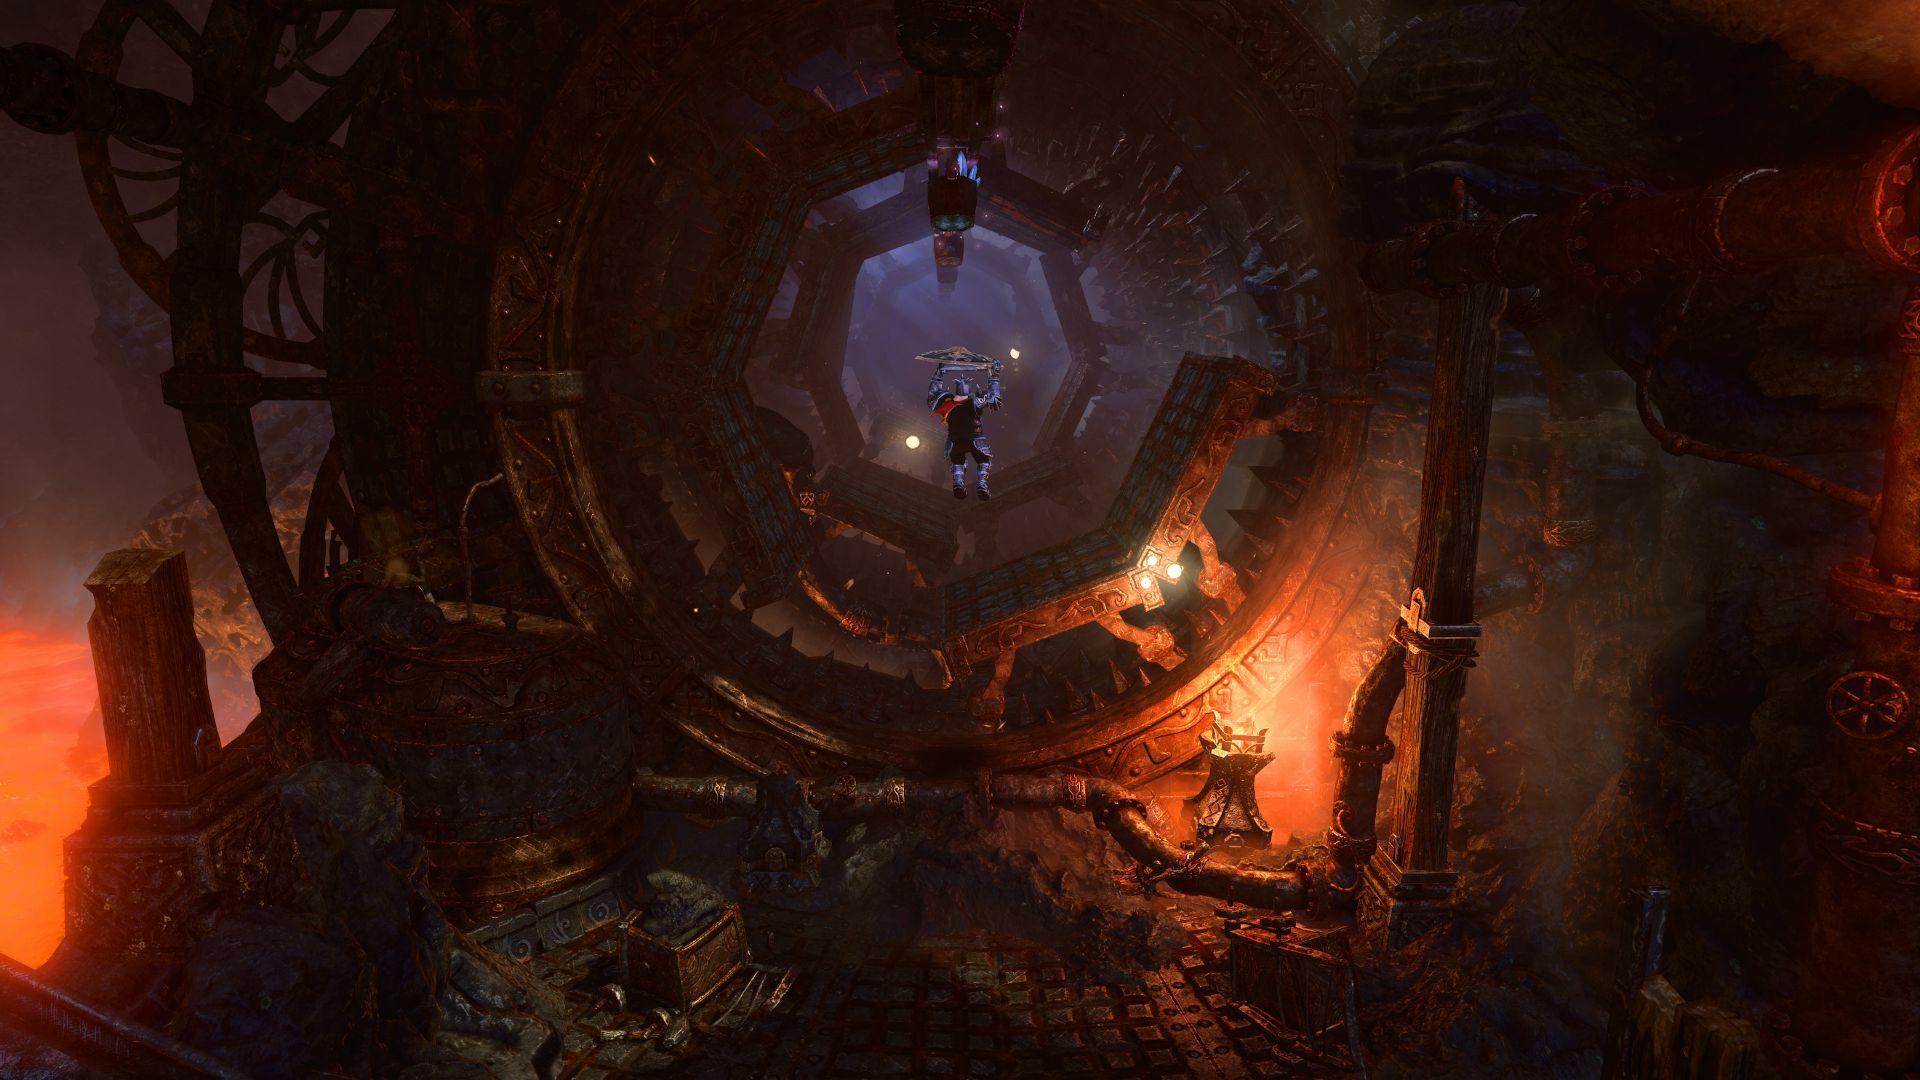 trine-3-the-artifacts-of-power-pc-screenshot-03